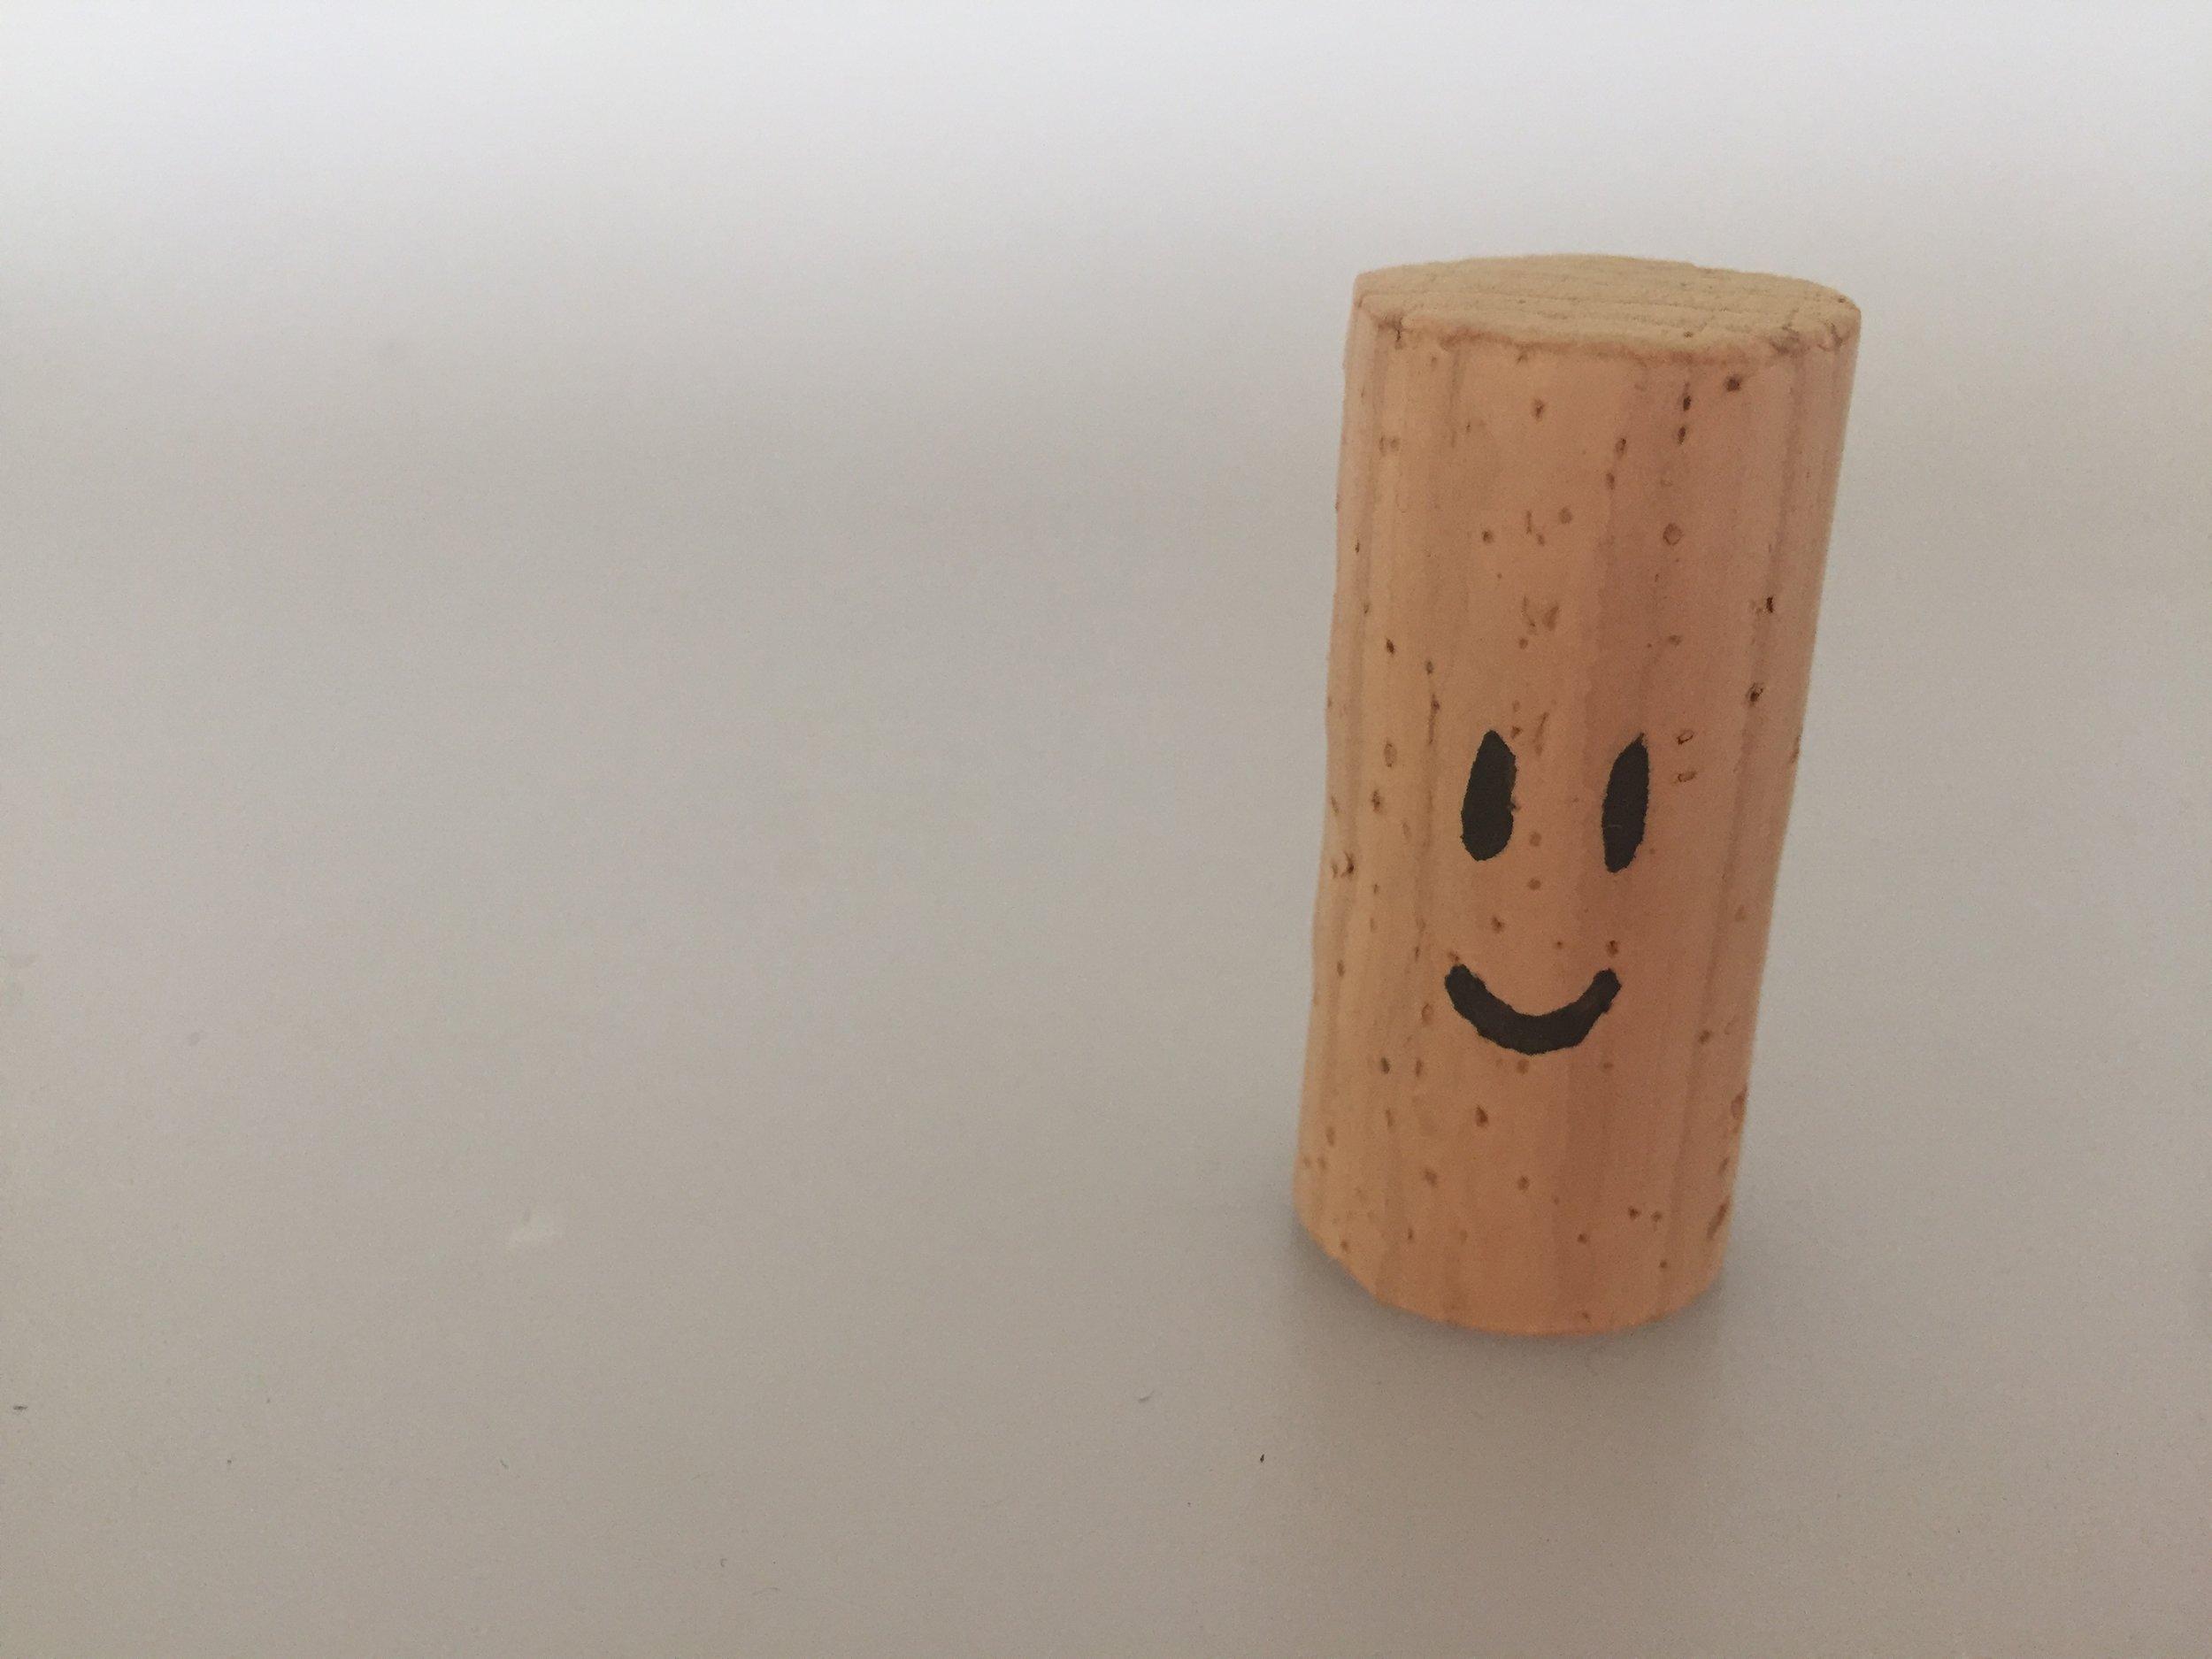 BOB - is made of cork.